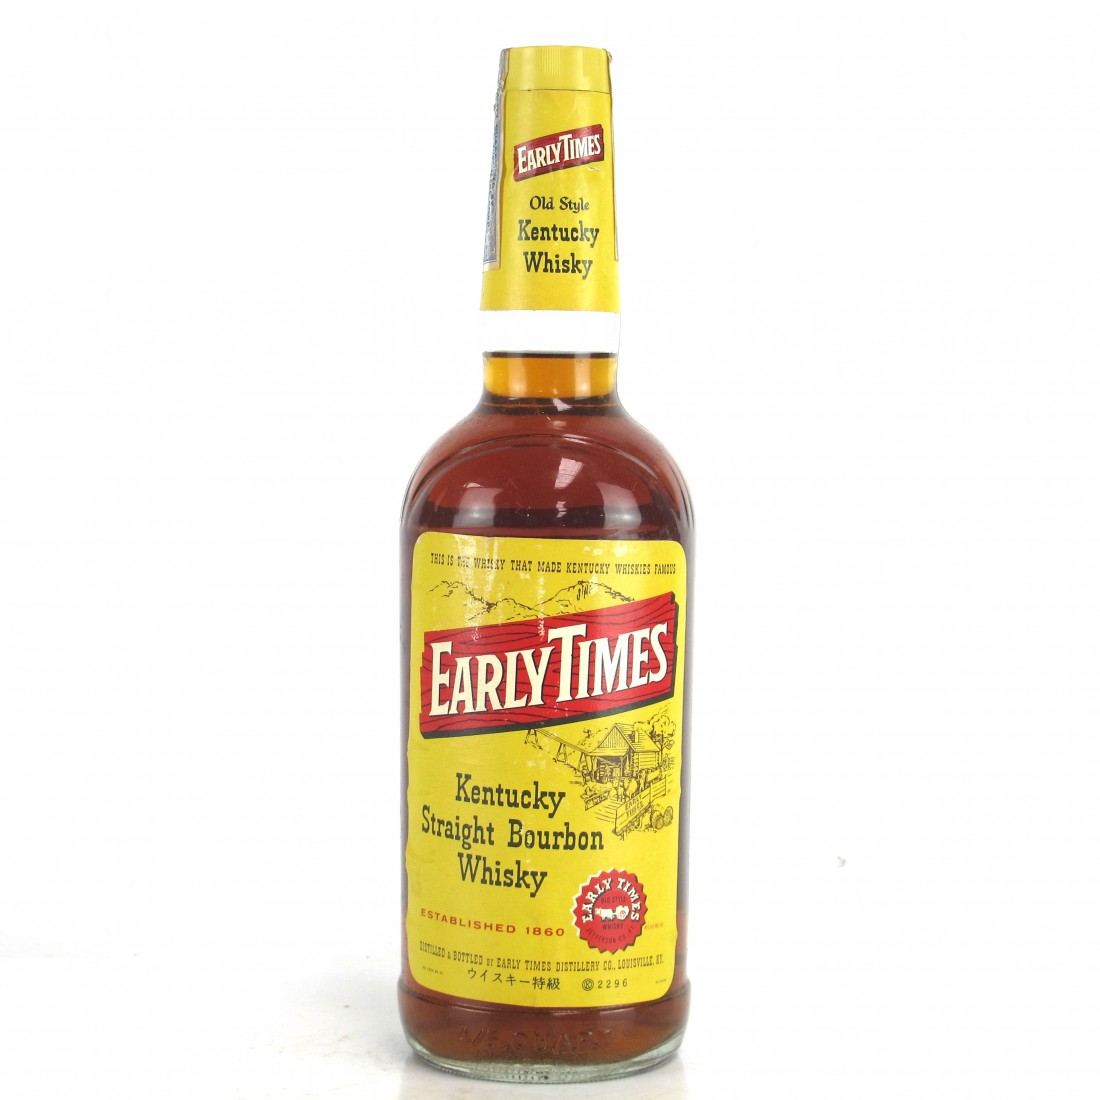 Early Times Kentucky Straight Bourbon 1970s